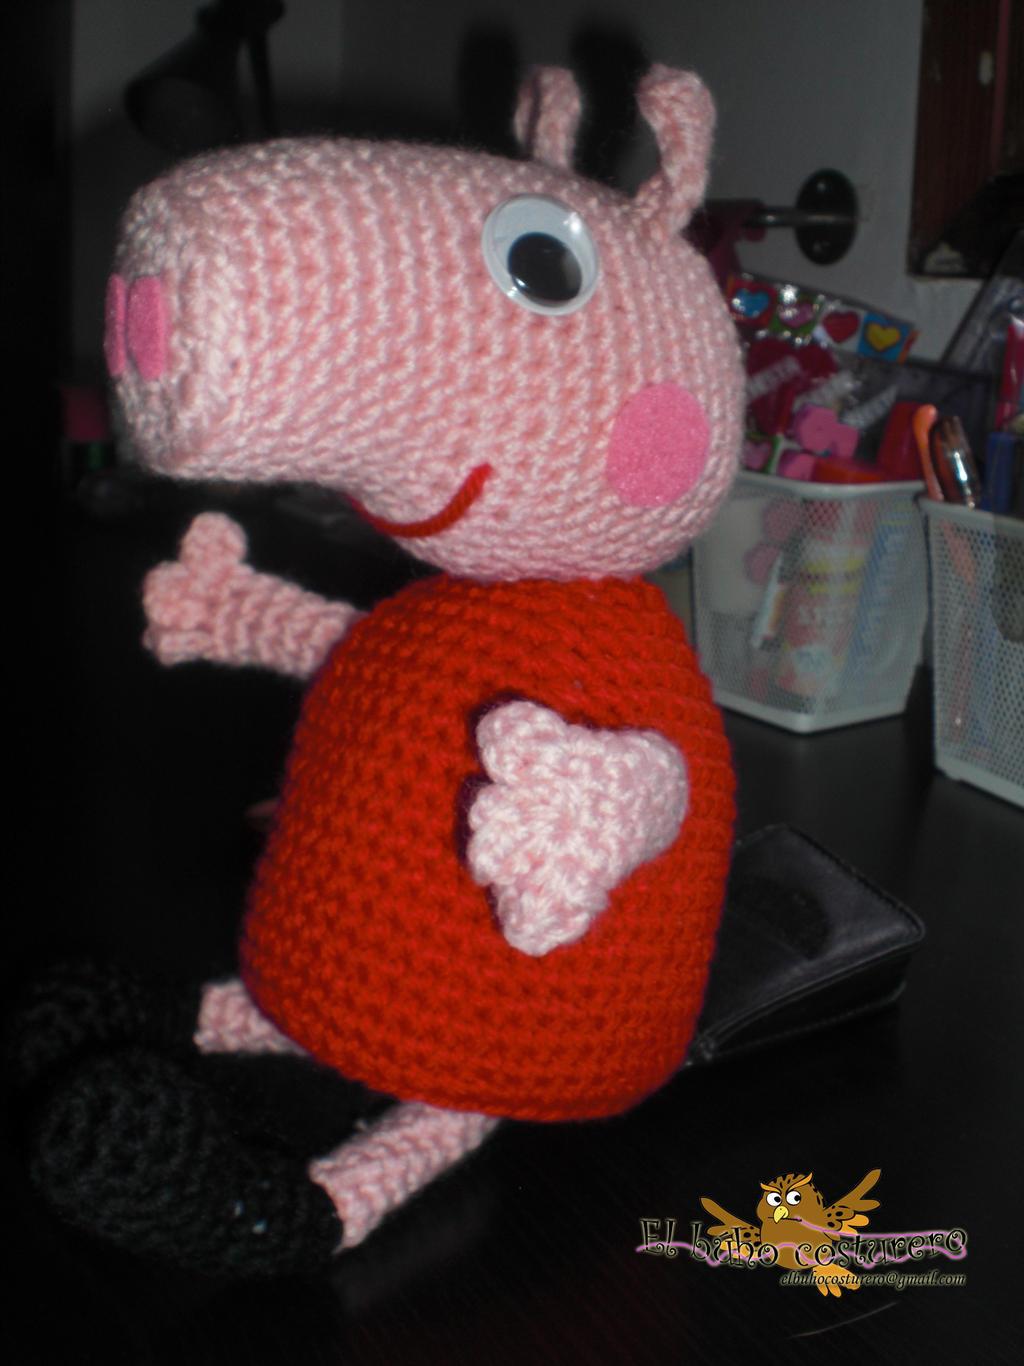 Peppa Pig Amigurumi Crochet : Peppa pig amigurumi by elbuhocosturero on DeviantArt